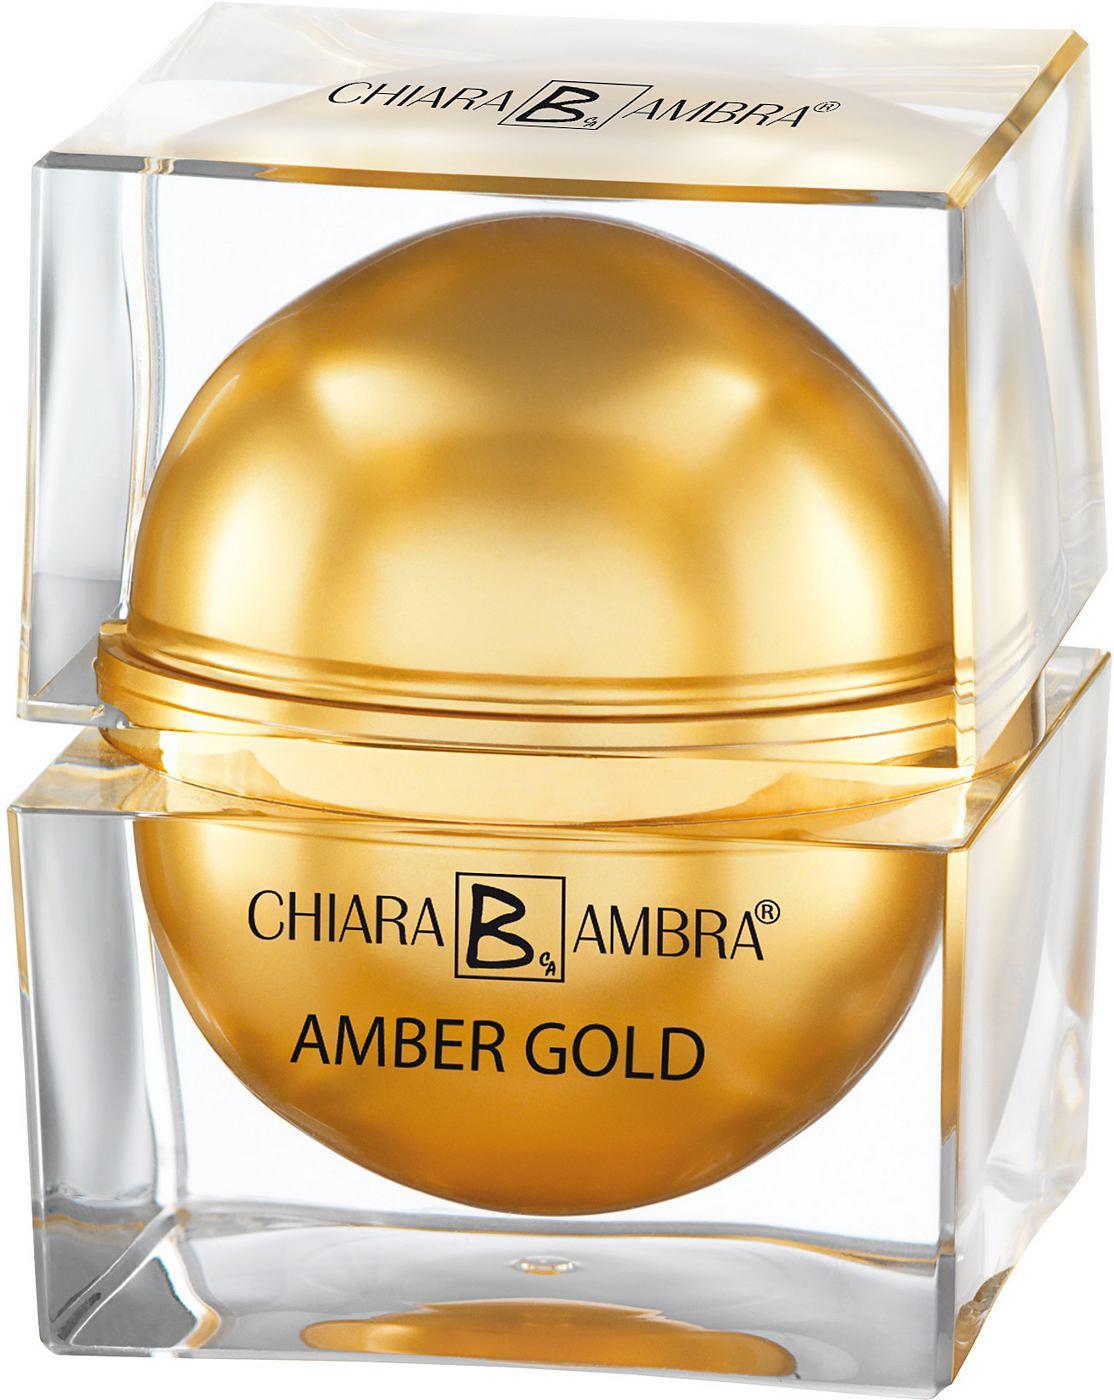 CHIARA AMBRA Crème Amber GOLD anti-aging